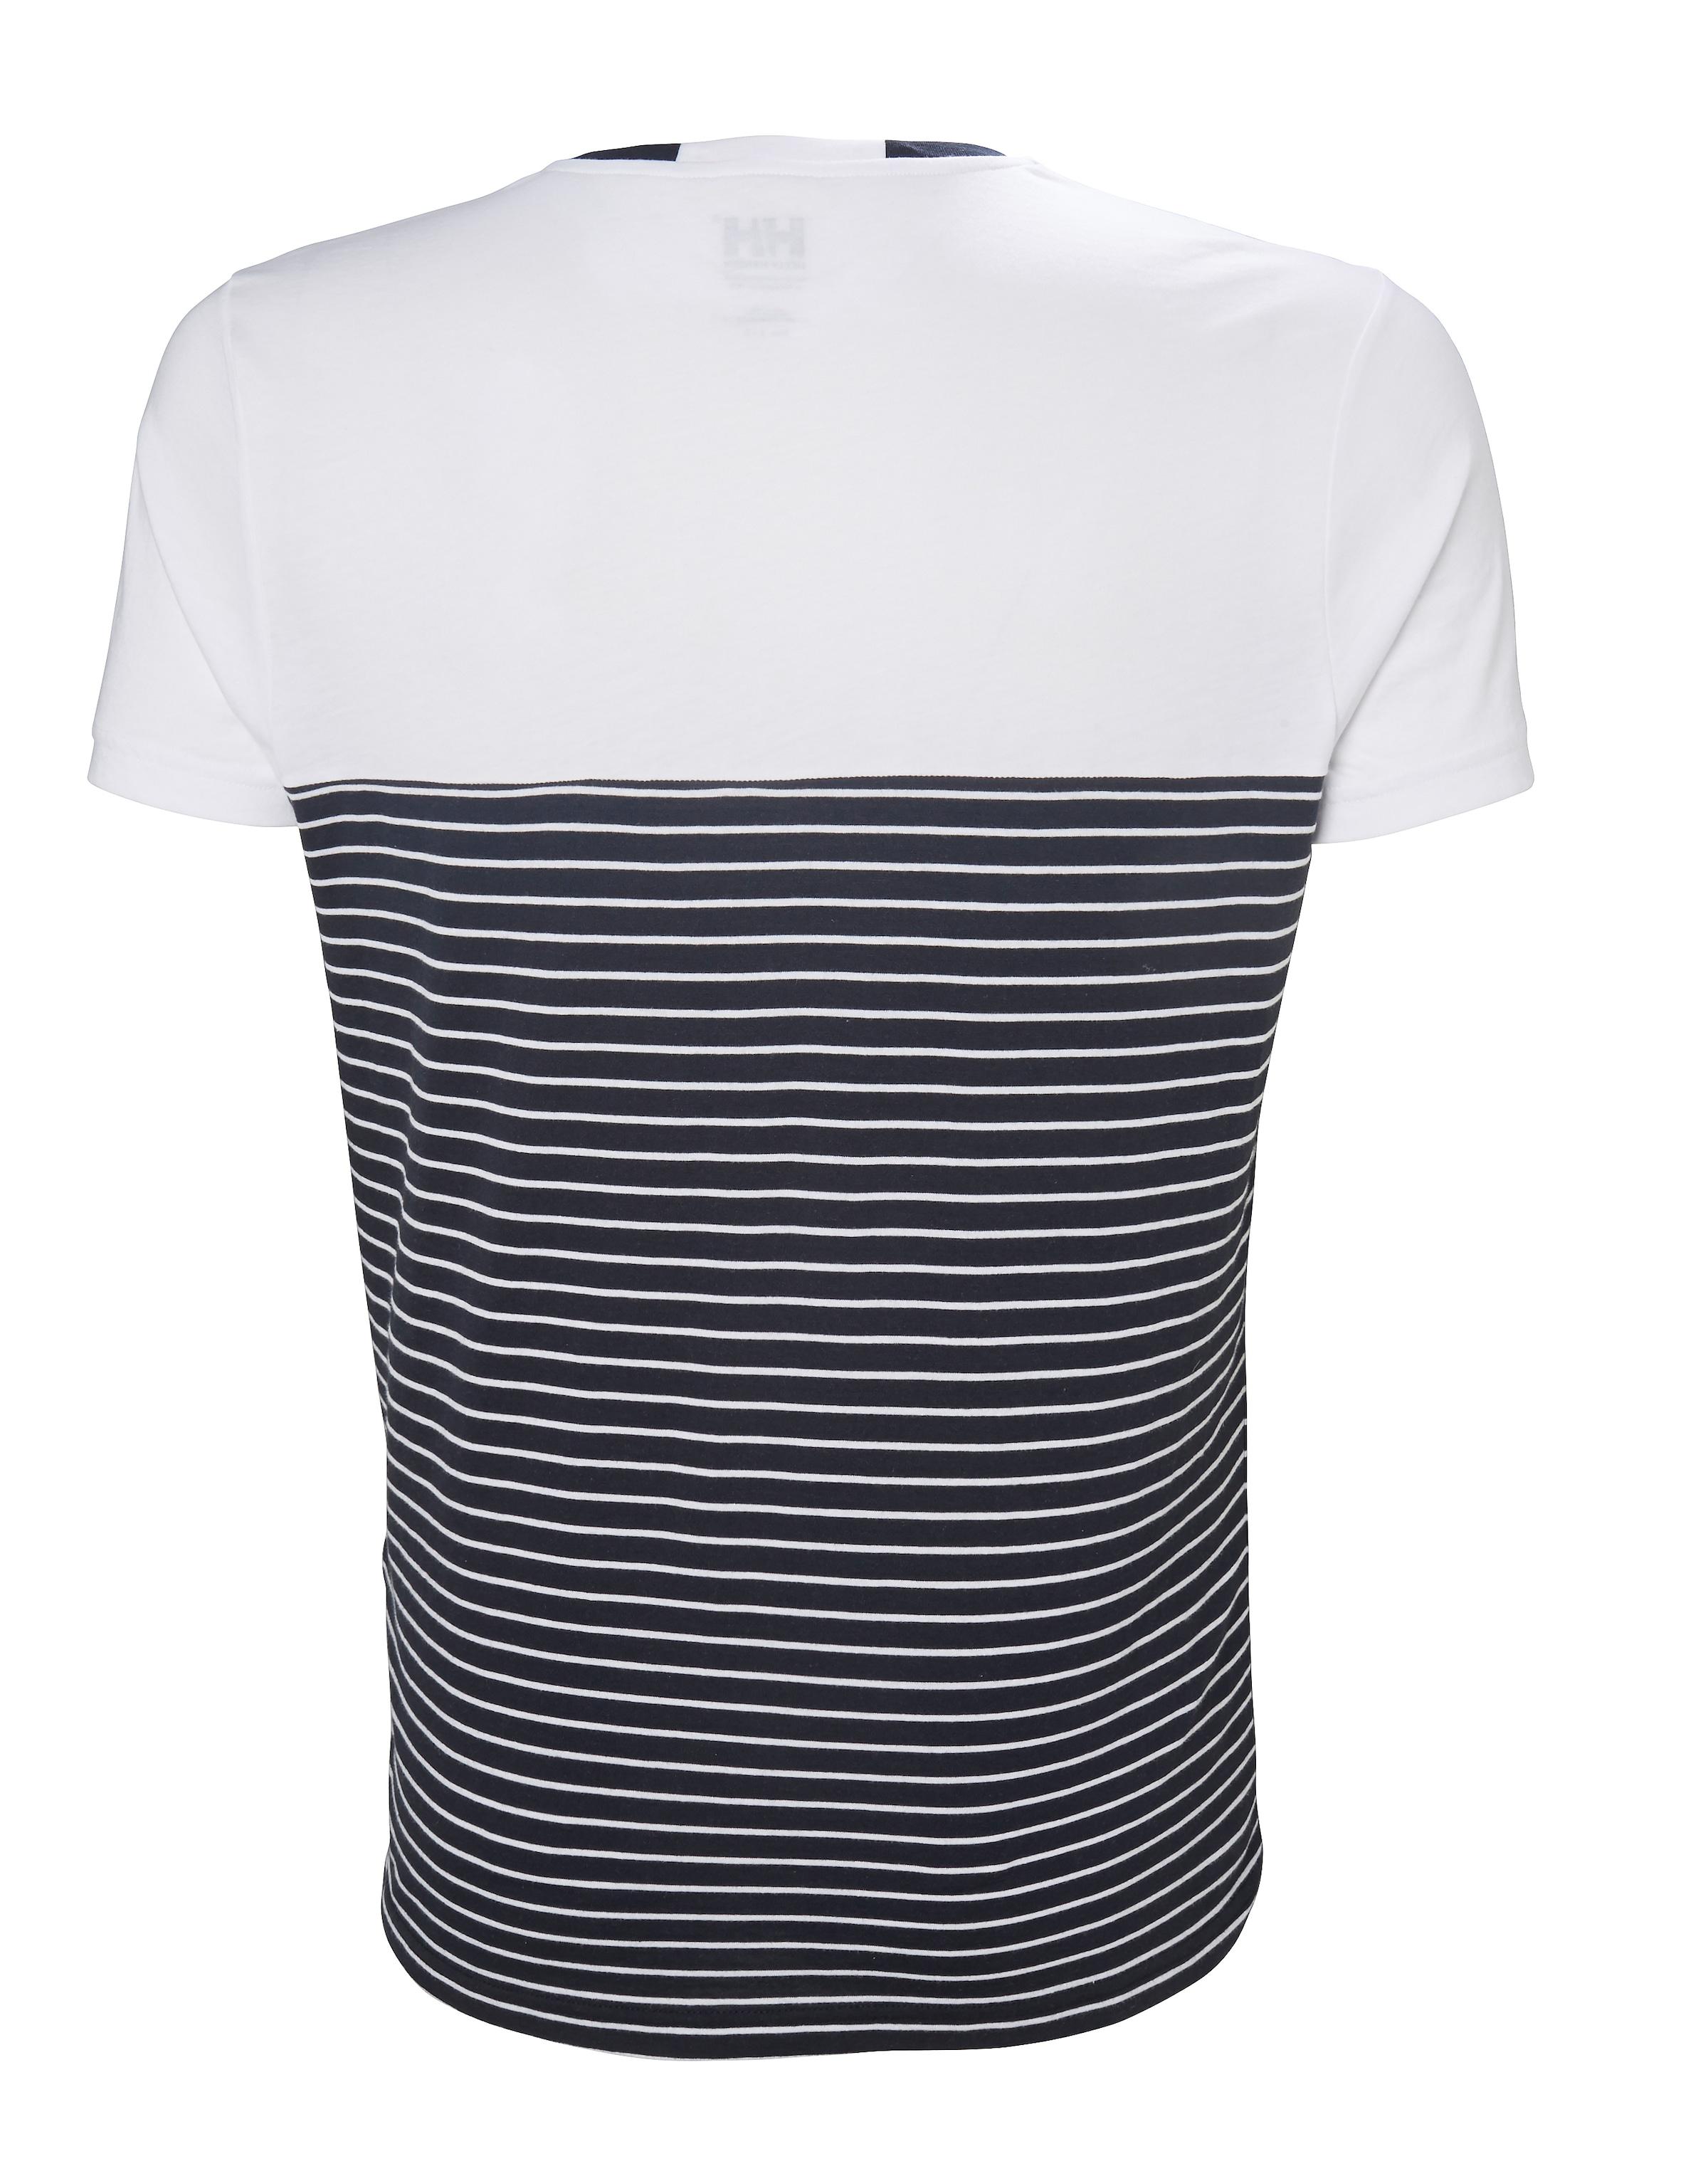 shirt In Hansen T HellbeigeNachtblau 'fjord' Helly Weiß FclJTK31